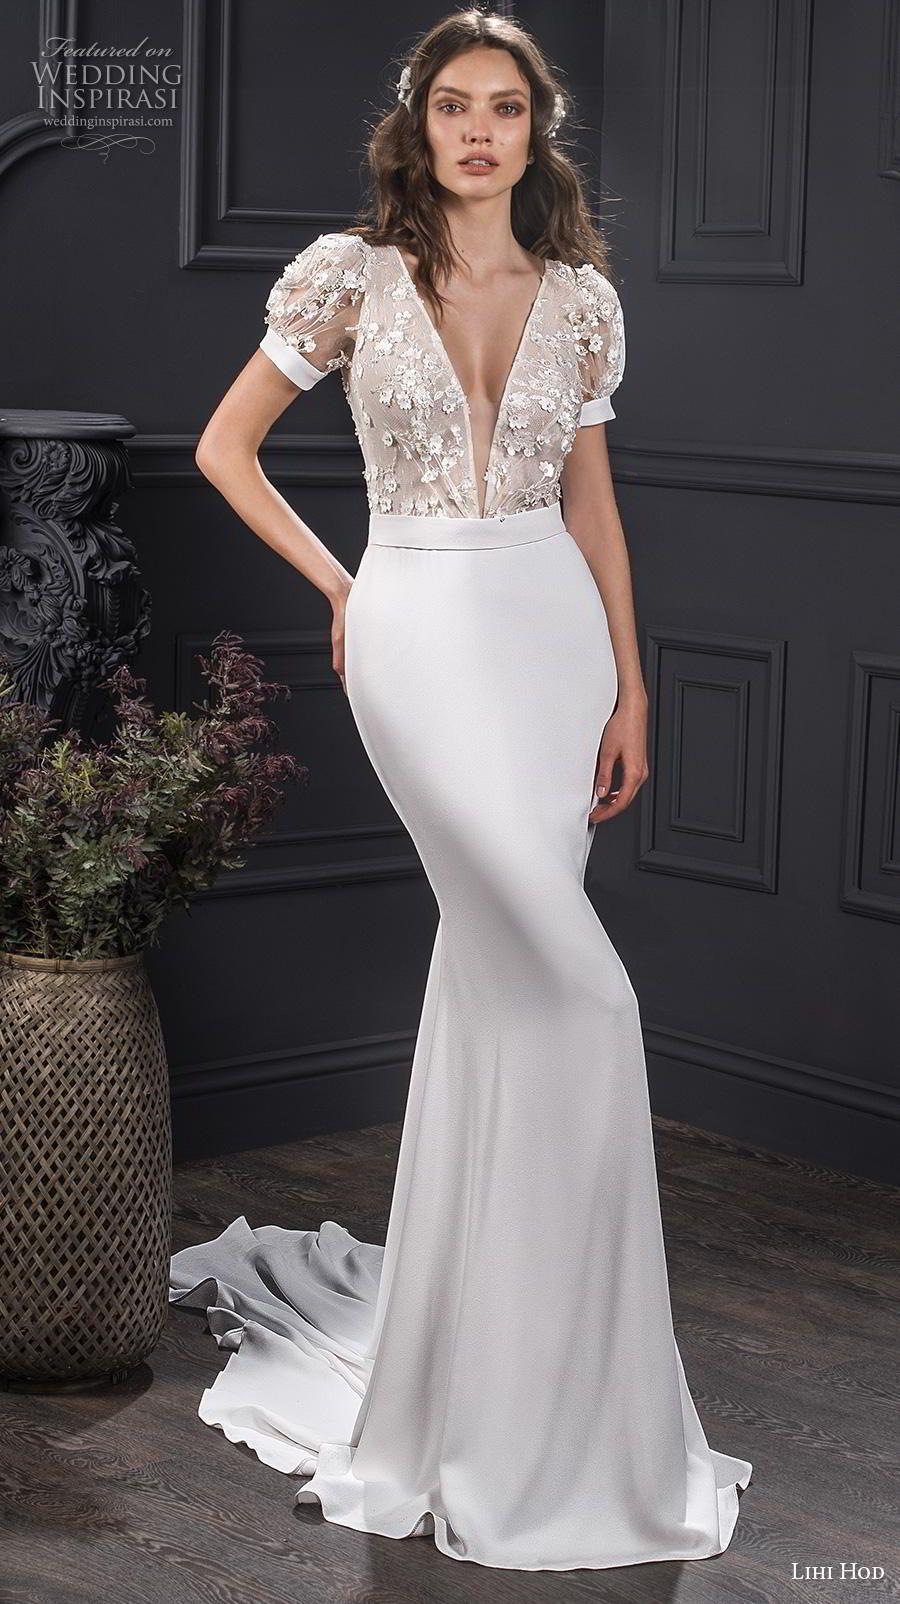 Pin On Latest Wedding Dresses More [ 1604 x 900 Pixel ]